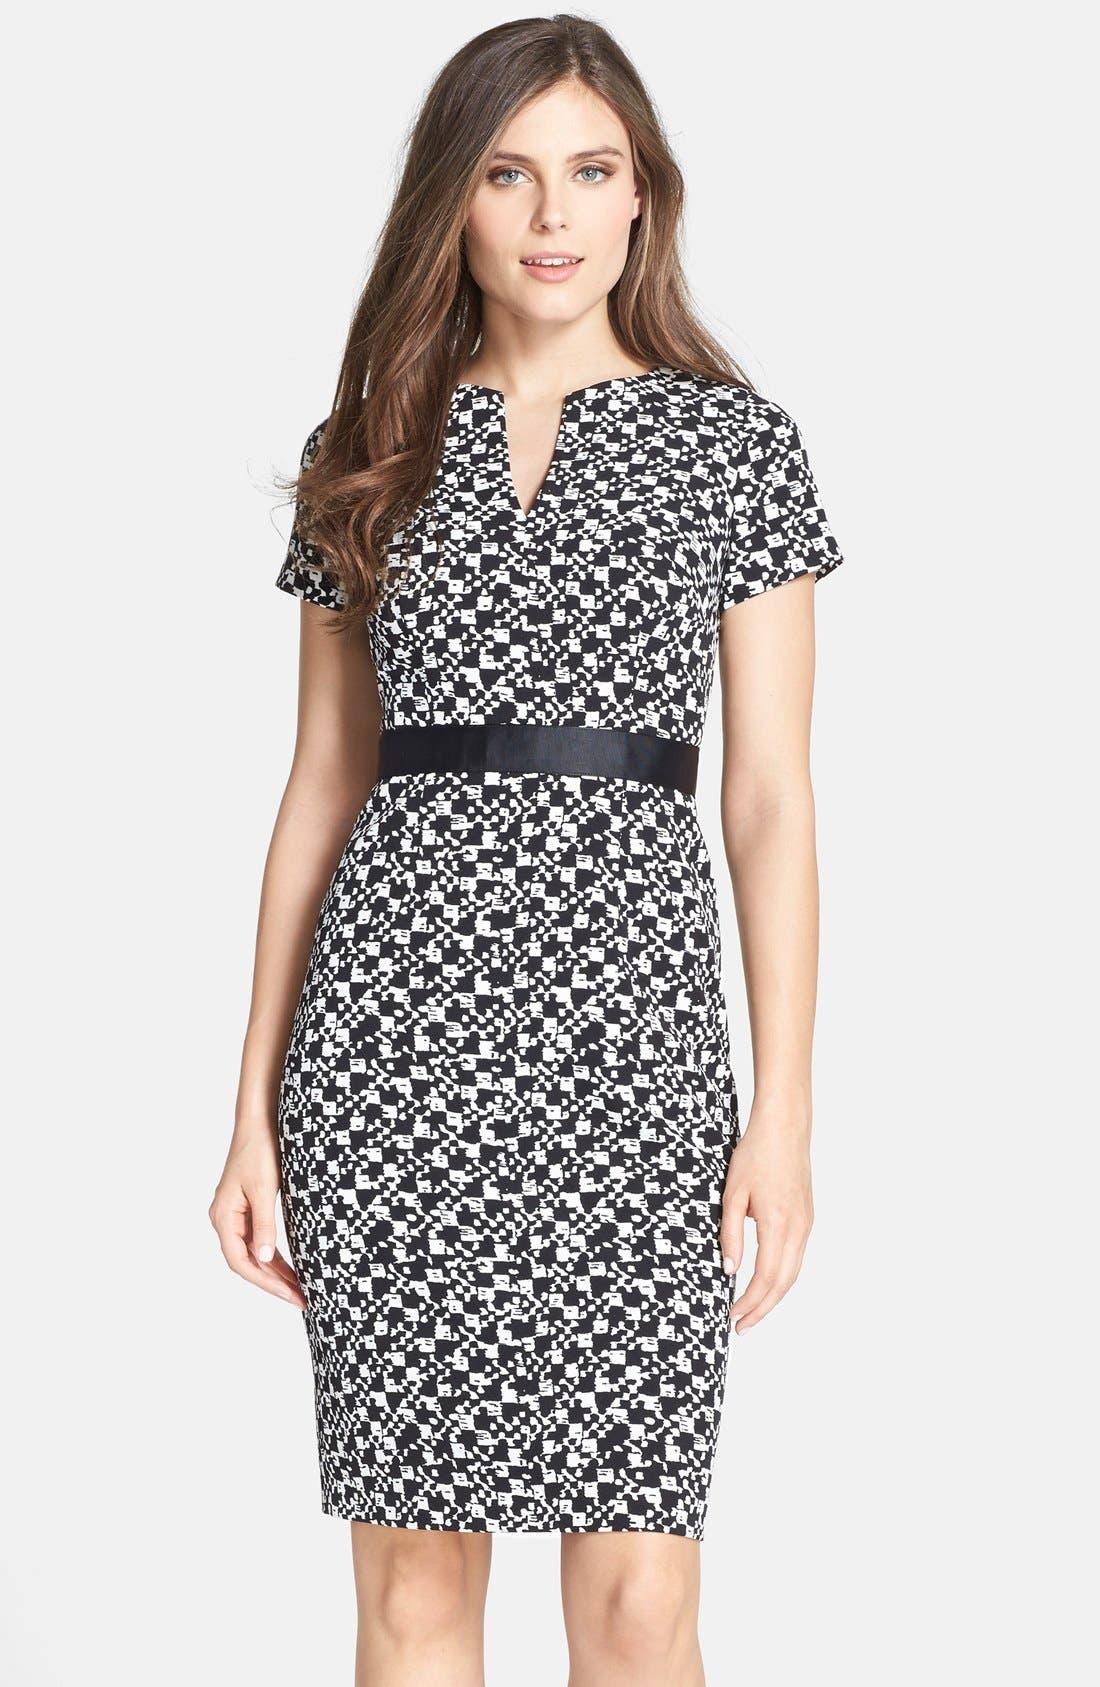 Alternate Image 1 Selected - Adrianna Papell Print Crepe Split Neck Sheath Dress